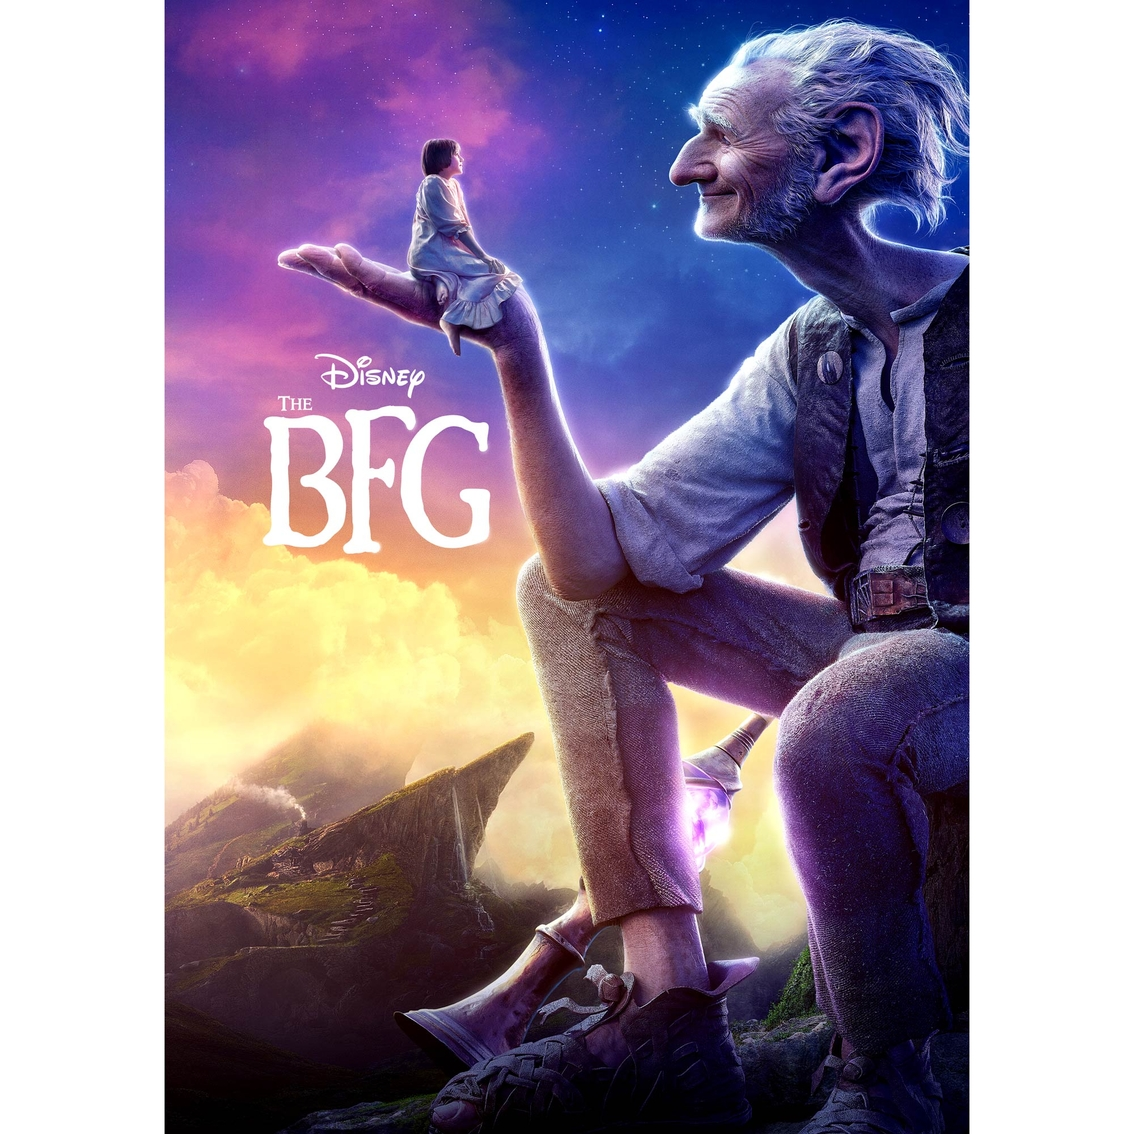 Disney The Bfg (blu-ray + Dvd) | Movies & Videos | Electronics | Shop